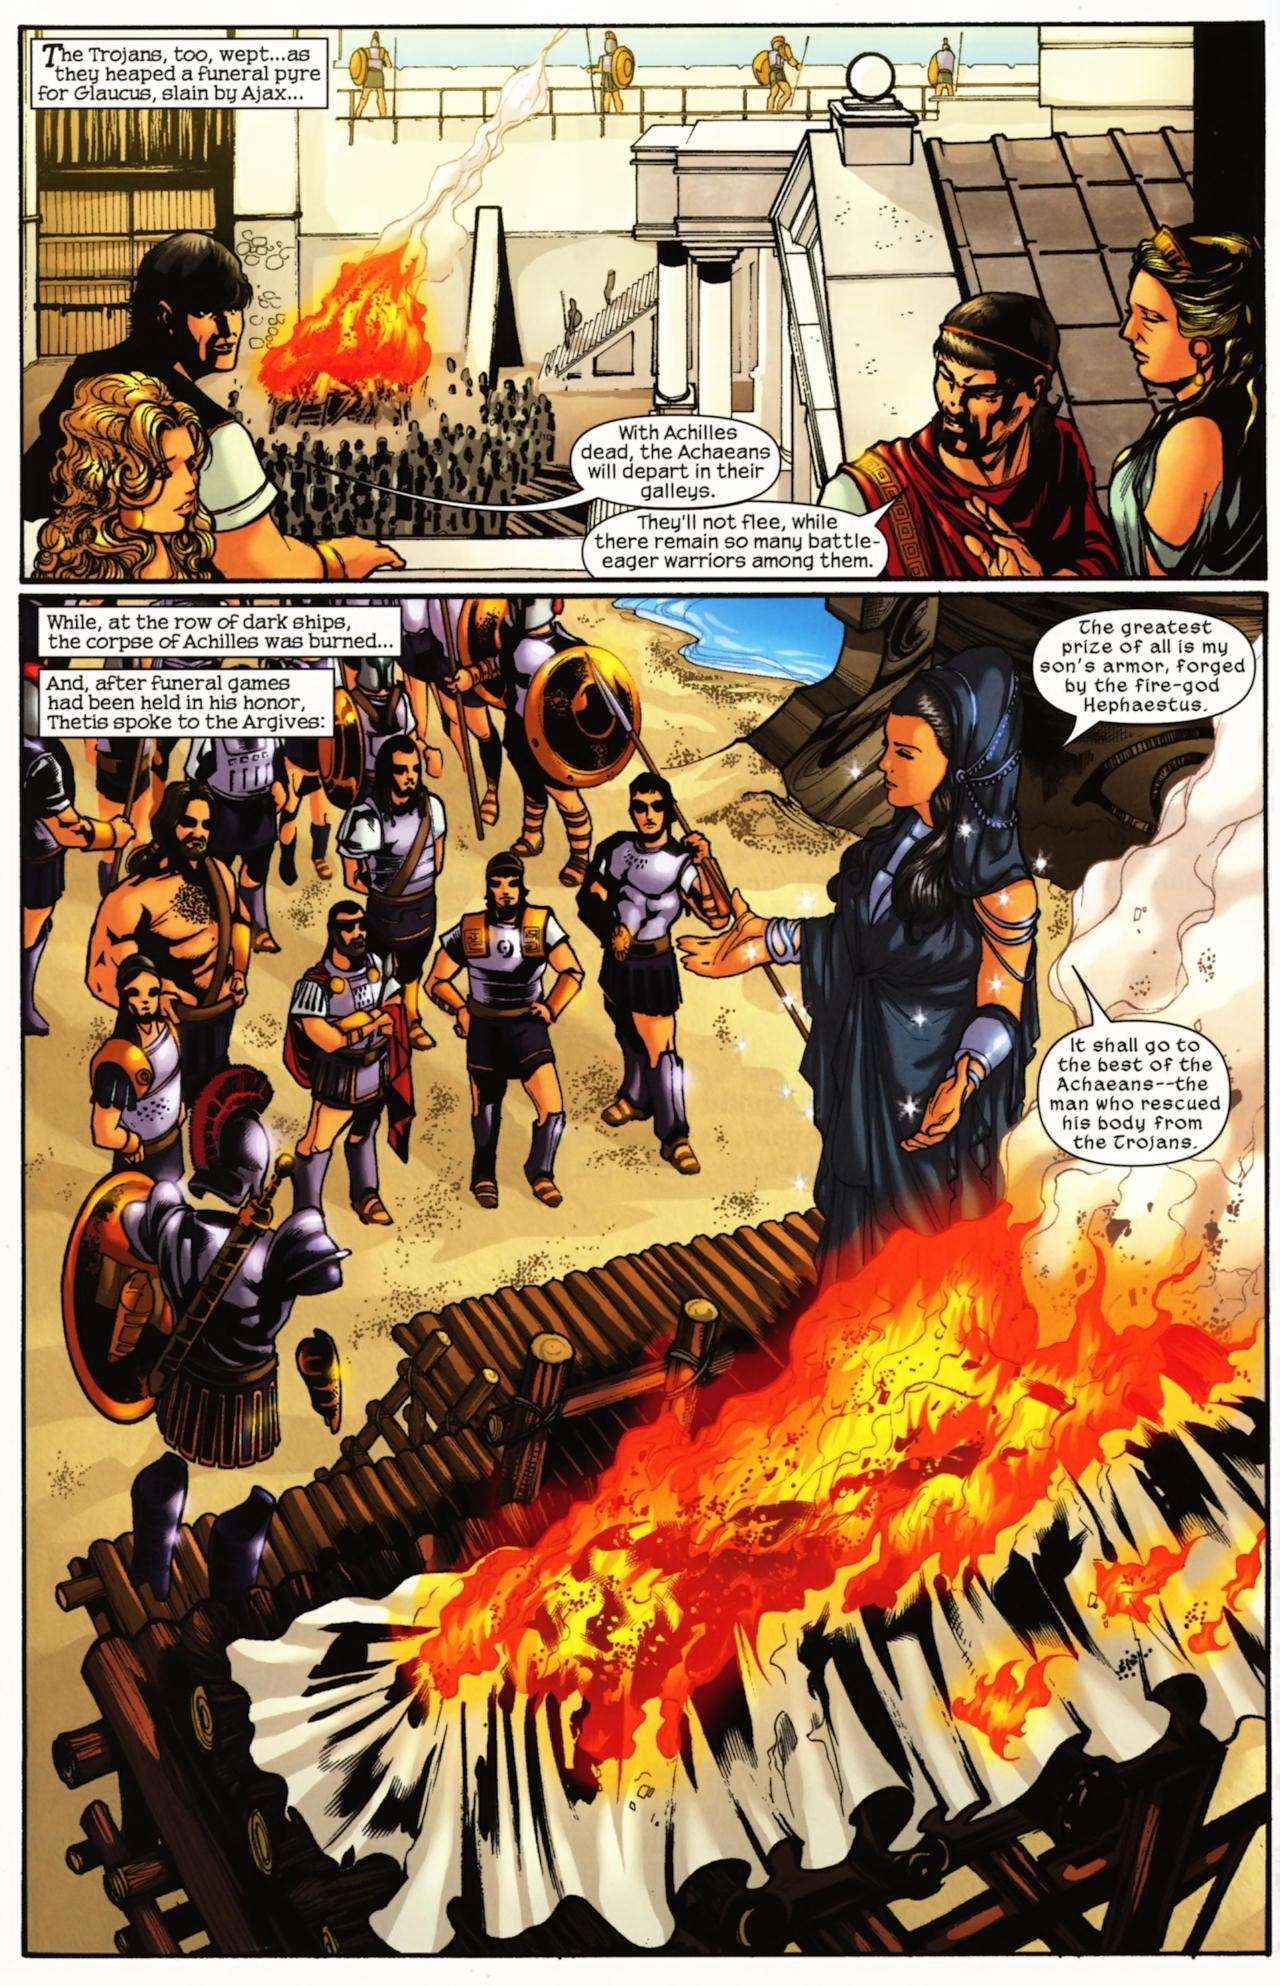 Read online Trojan War comic -  Issue #4 - 4